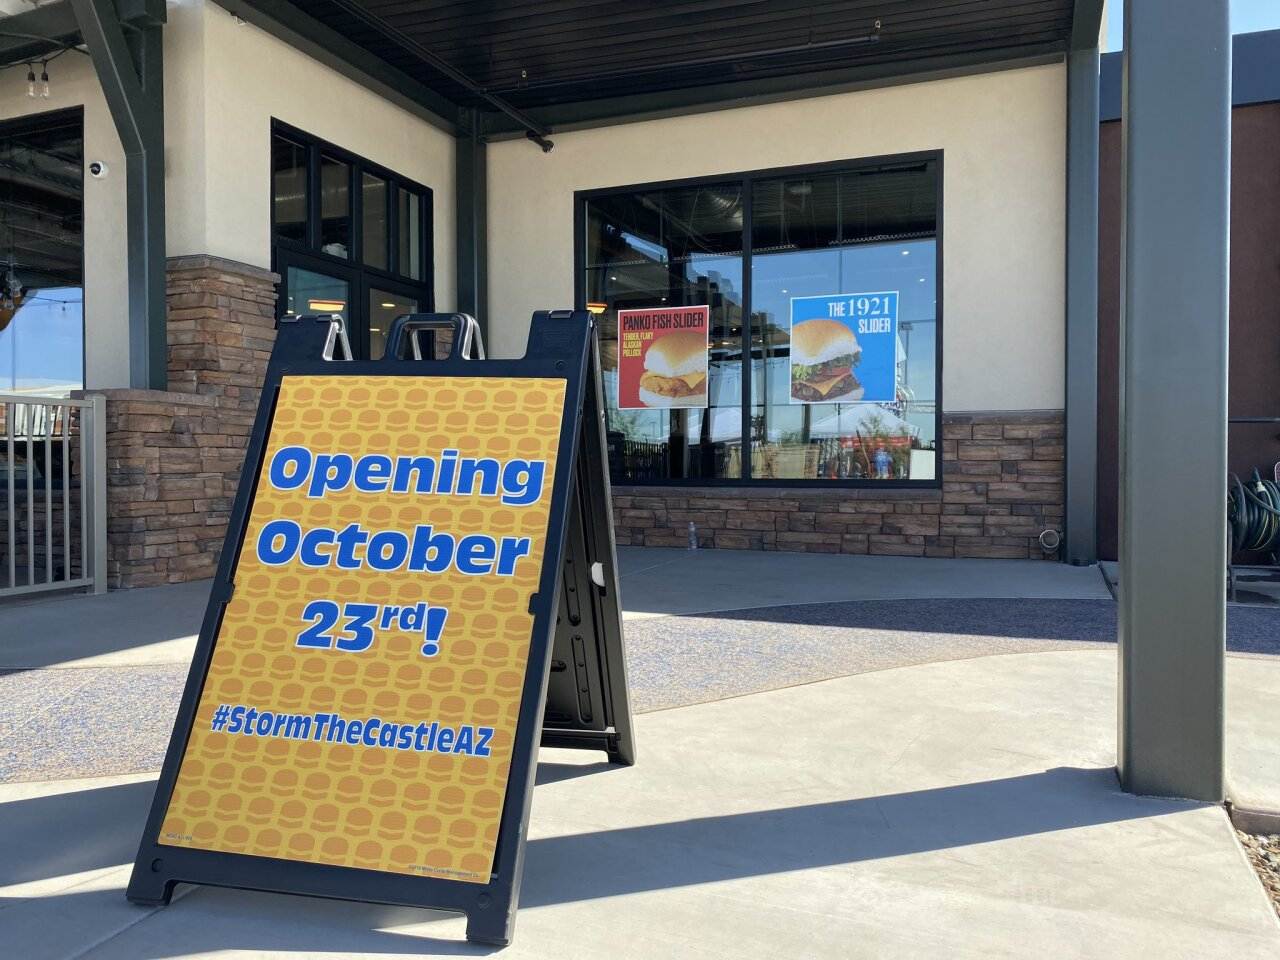 AZ White Castle location set to open